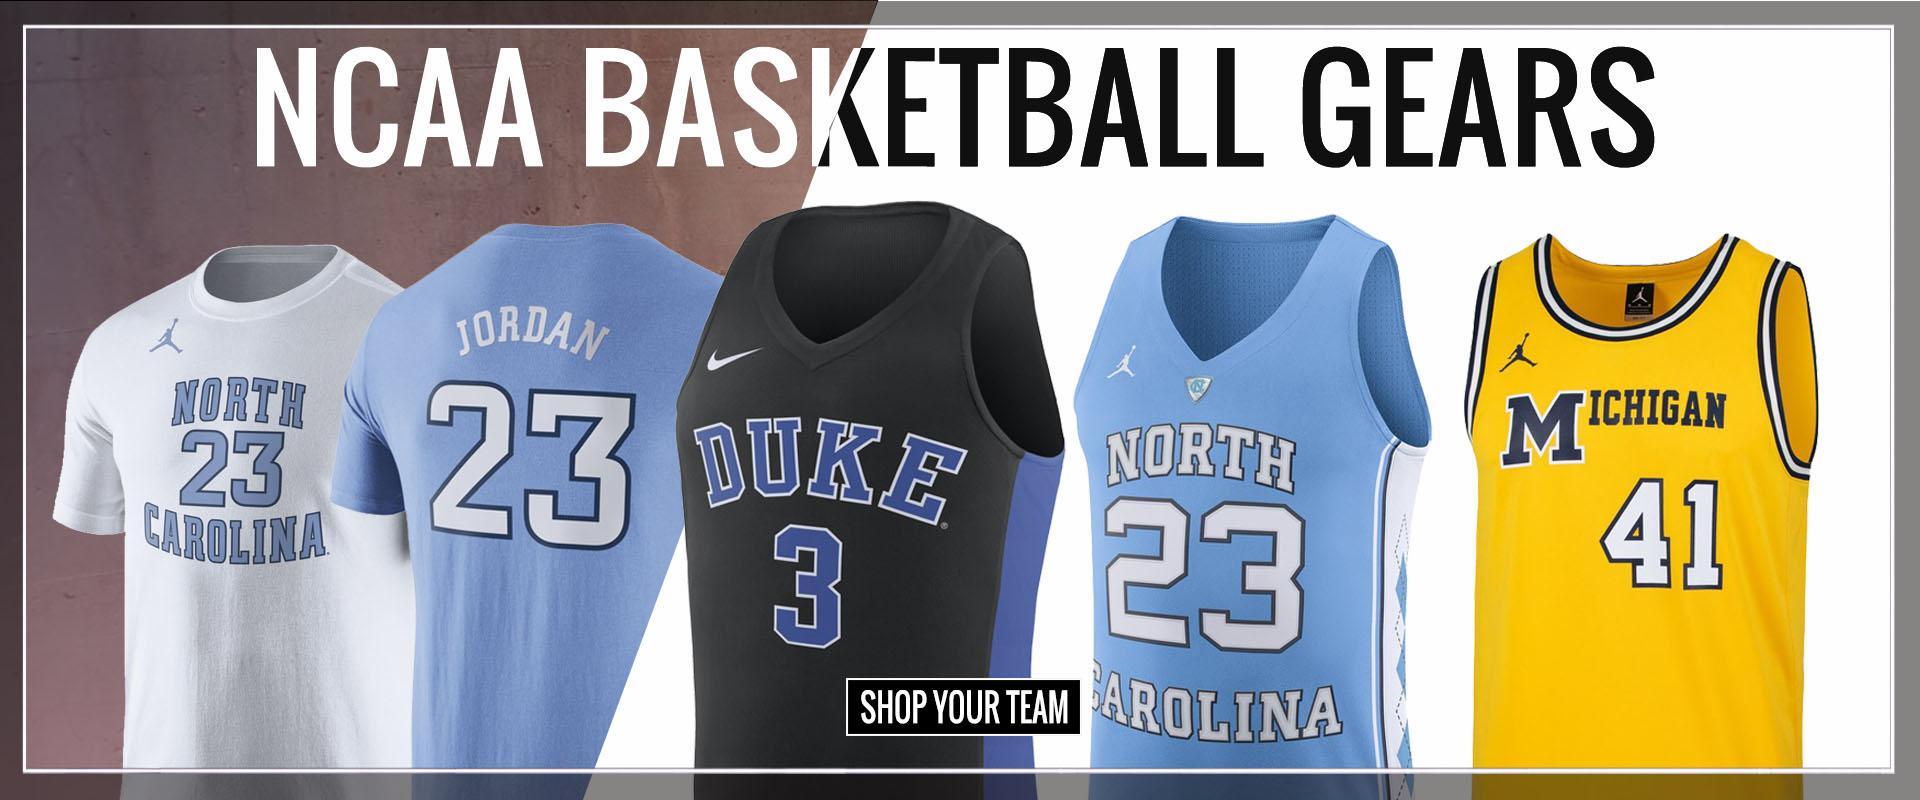 University basketball player shirts shop